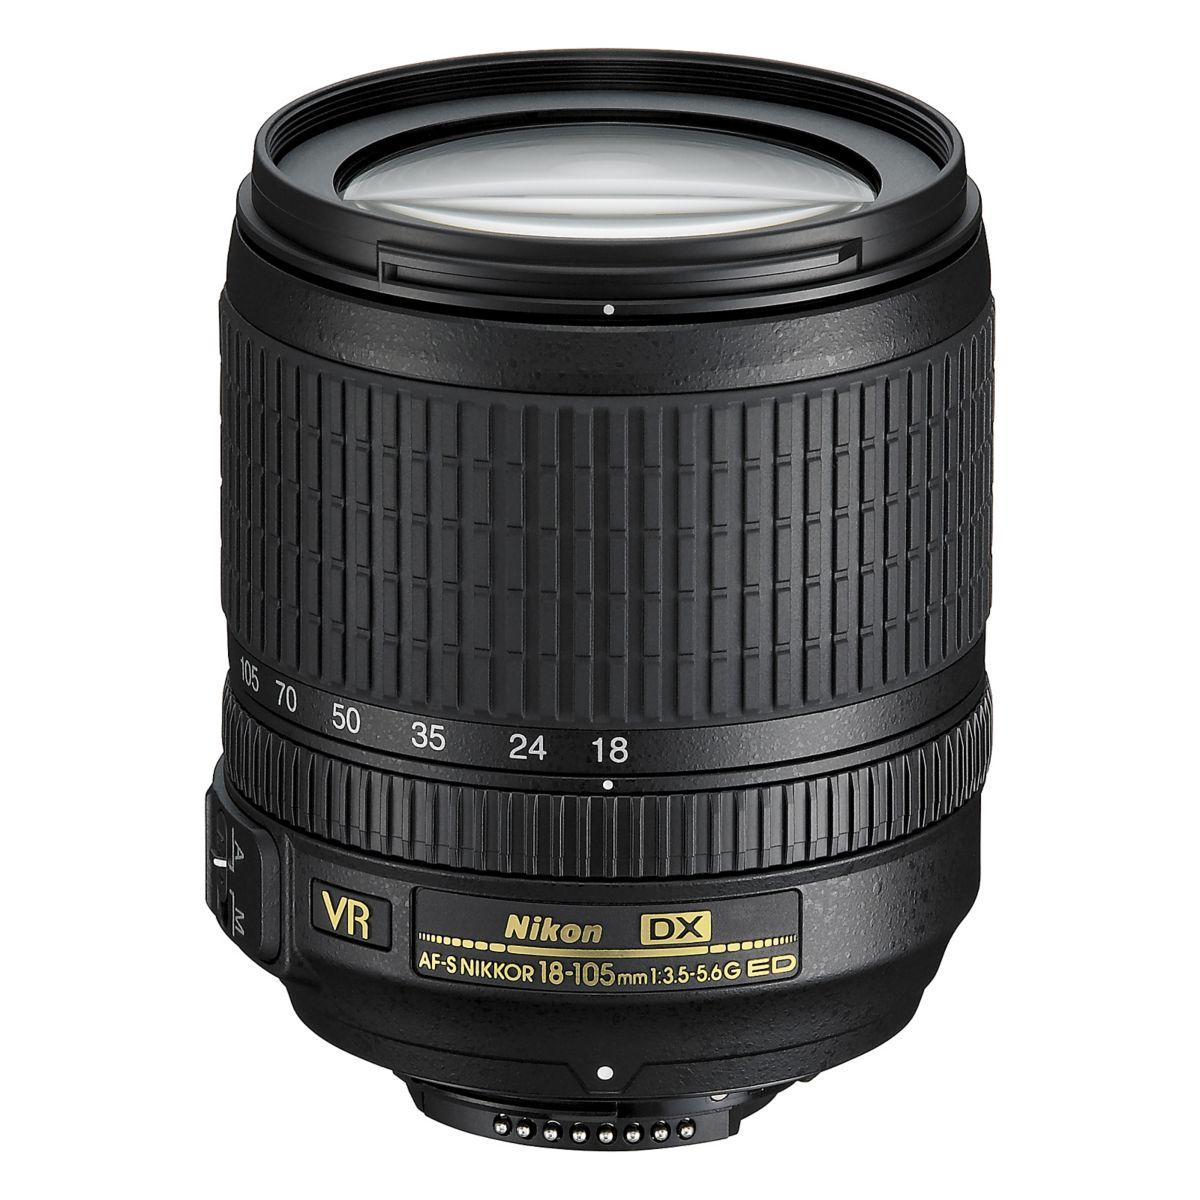 Objectif pour Reflex NIKON AF-S DX 18-105mm f/3.5-5.6G ED VR N...